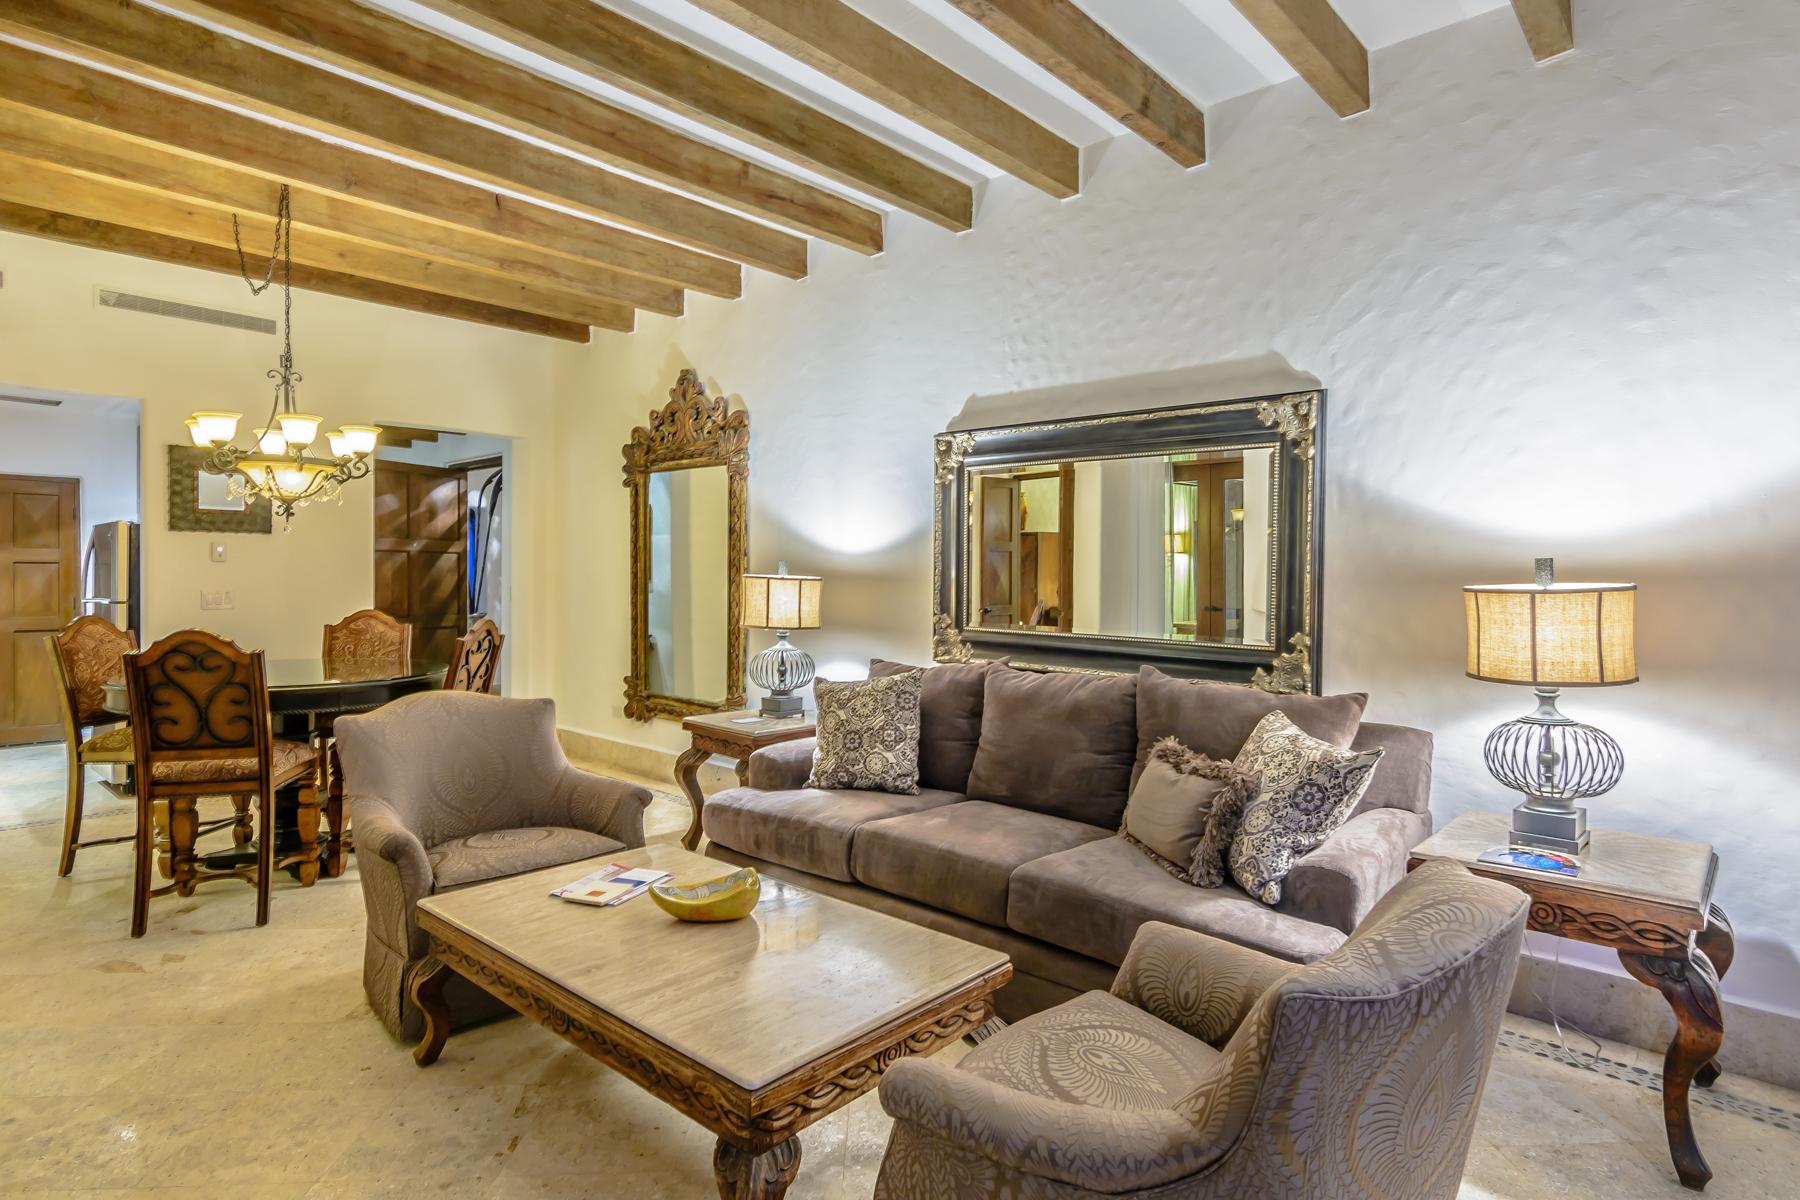 Additional photo for property listing at Las Ventanas al Paraíso Residence 1303 San Jose Del Cabo, Baja California Sur Mexico